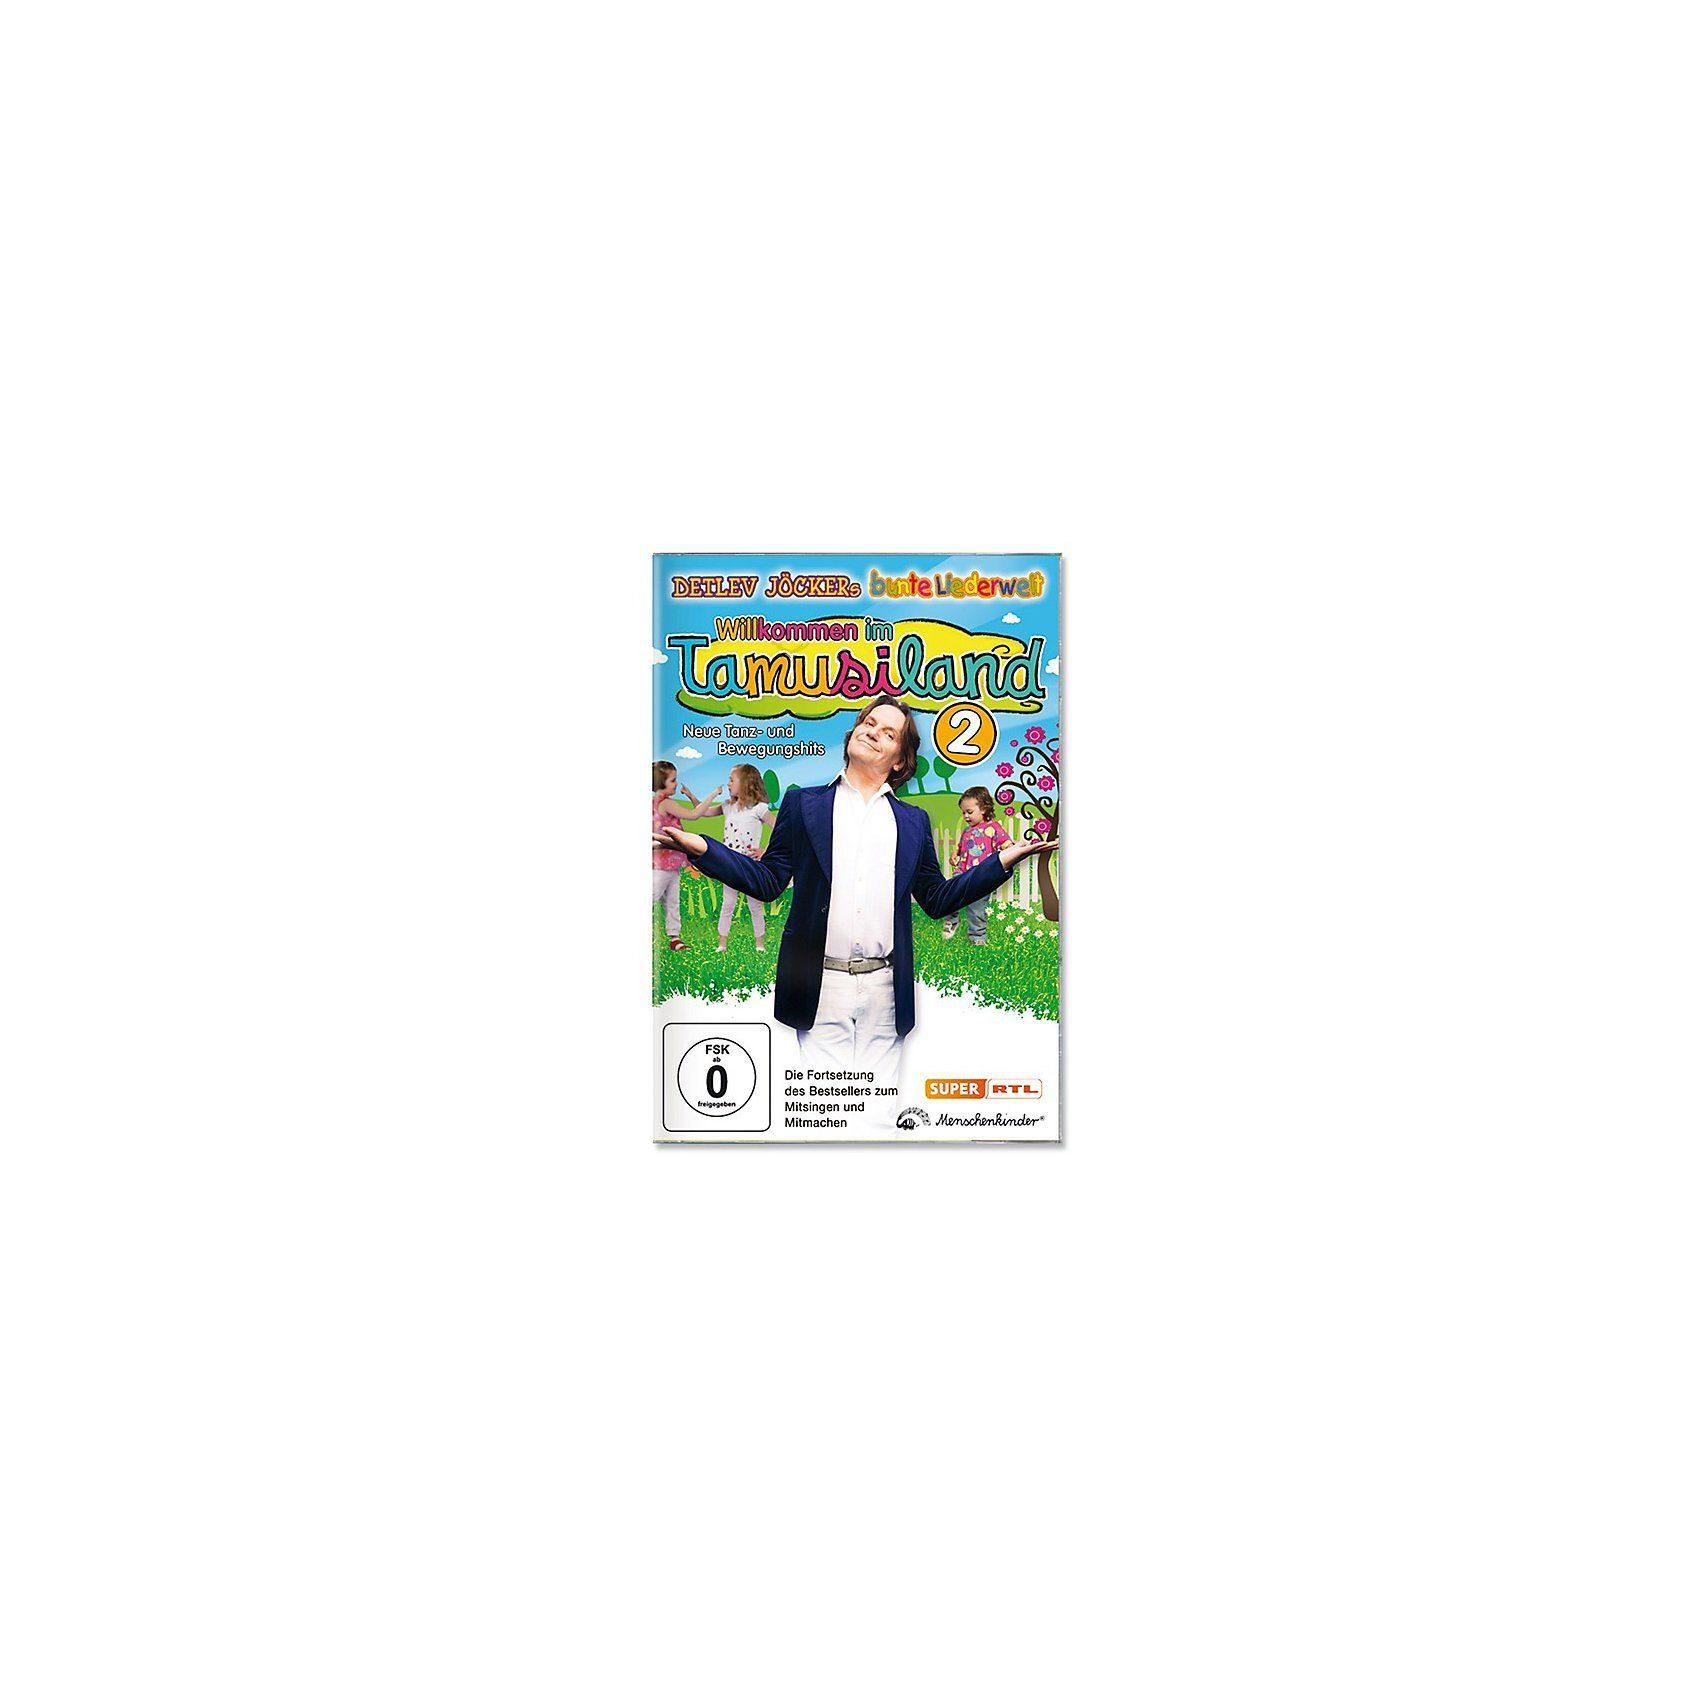 Universal DVD Detlev Jöcker - Willkommen im Tamusiland 2